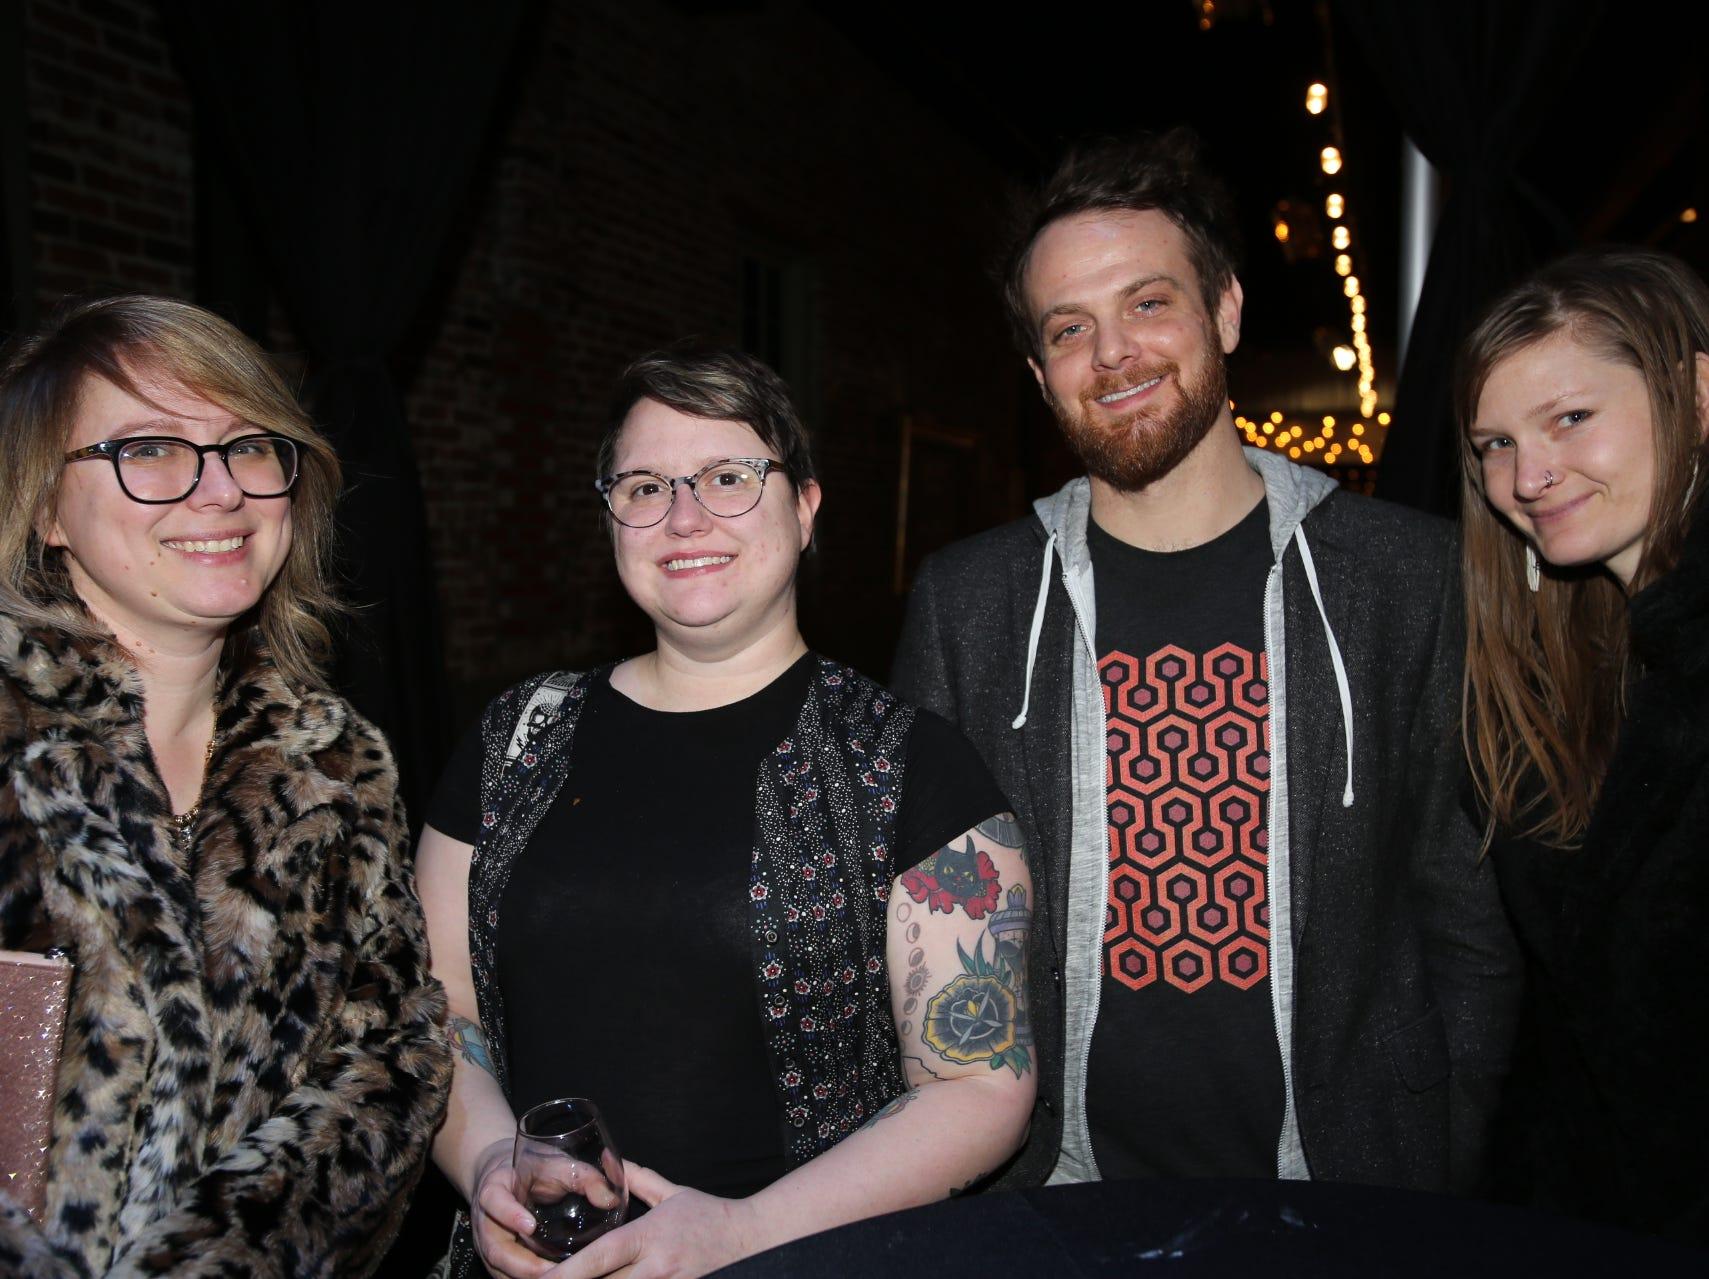 Nicole Chilton, Rachel Johnson, Tyler Drenon, and Anne Dezort